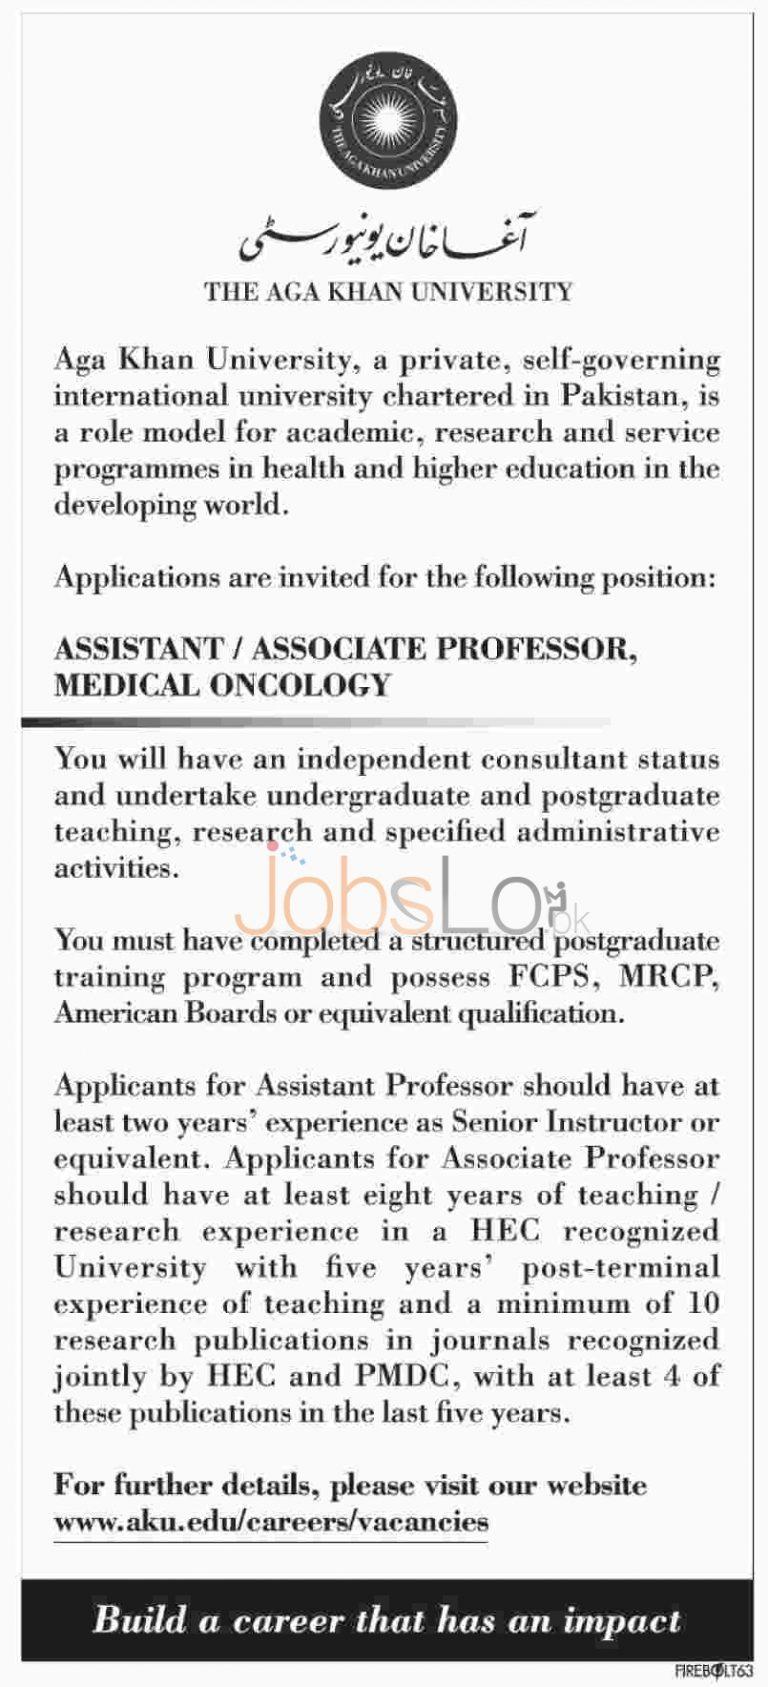 Agha Khan University Jobs in Karachi 2016 for Assistant & Associate Professor